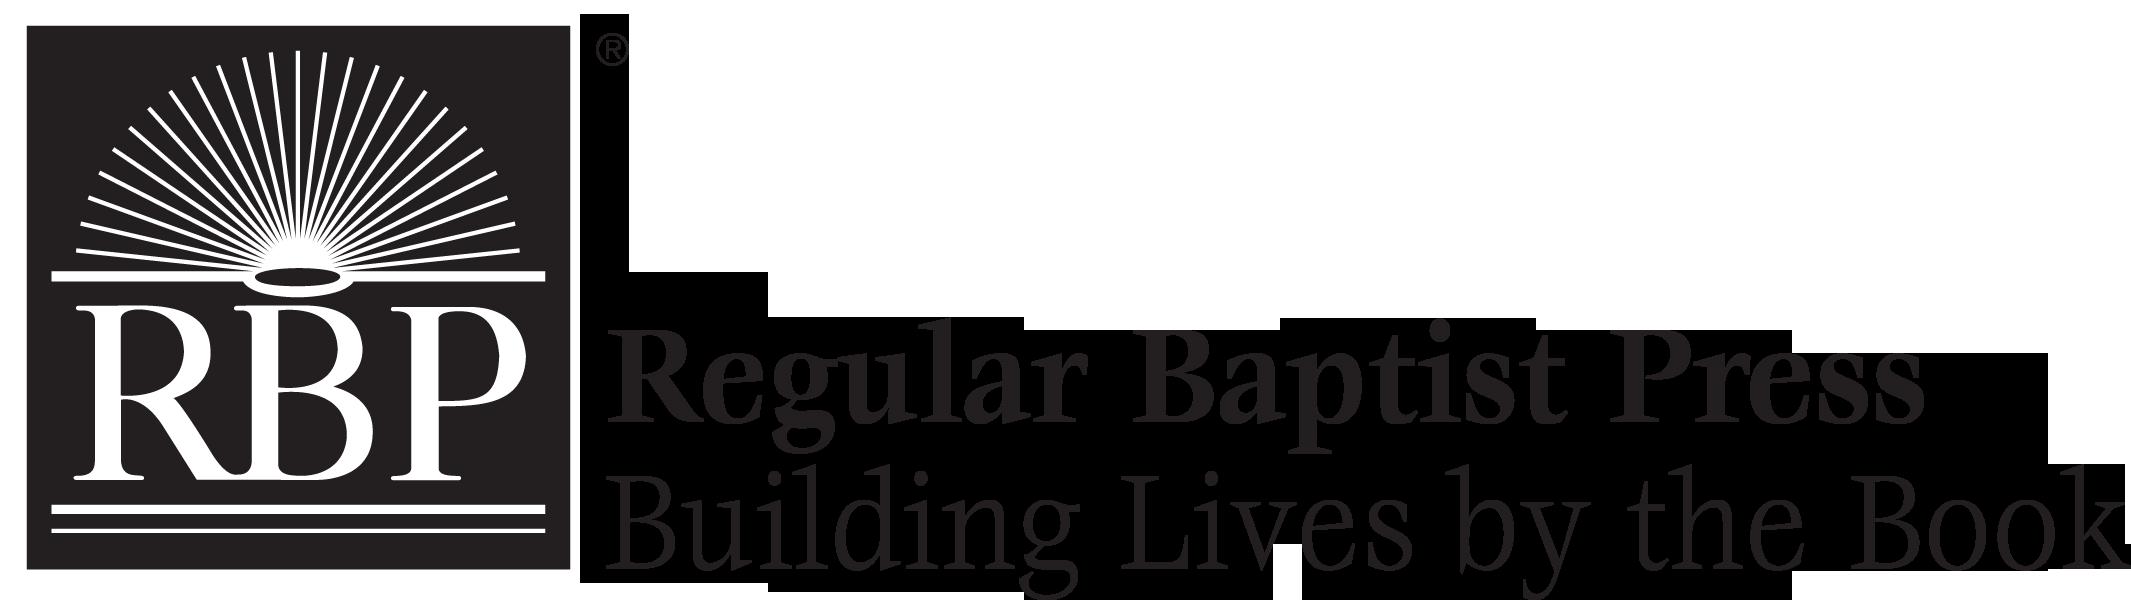 RBP Logo With Tagline Left